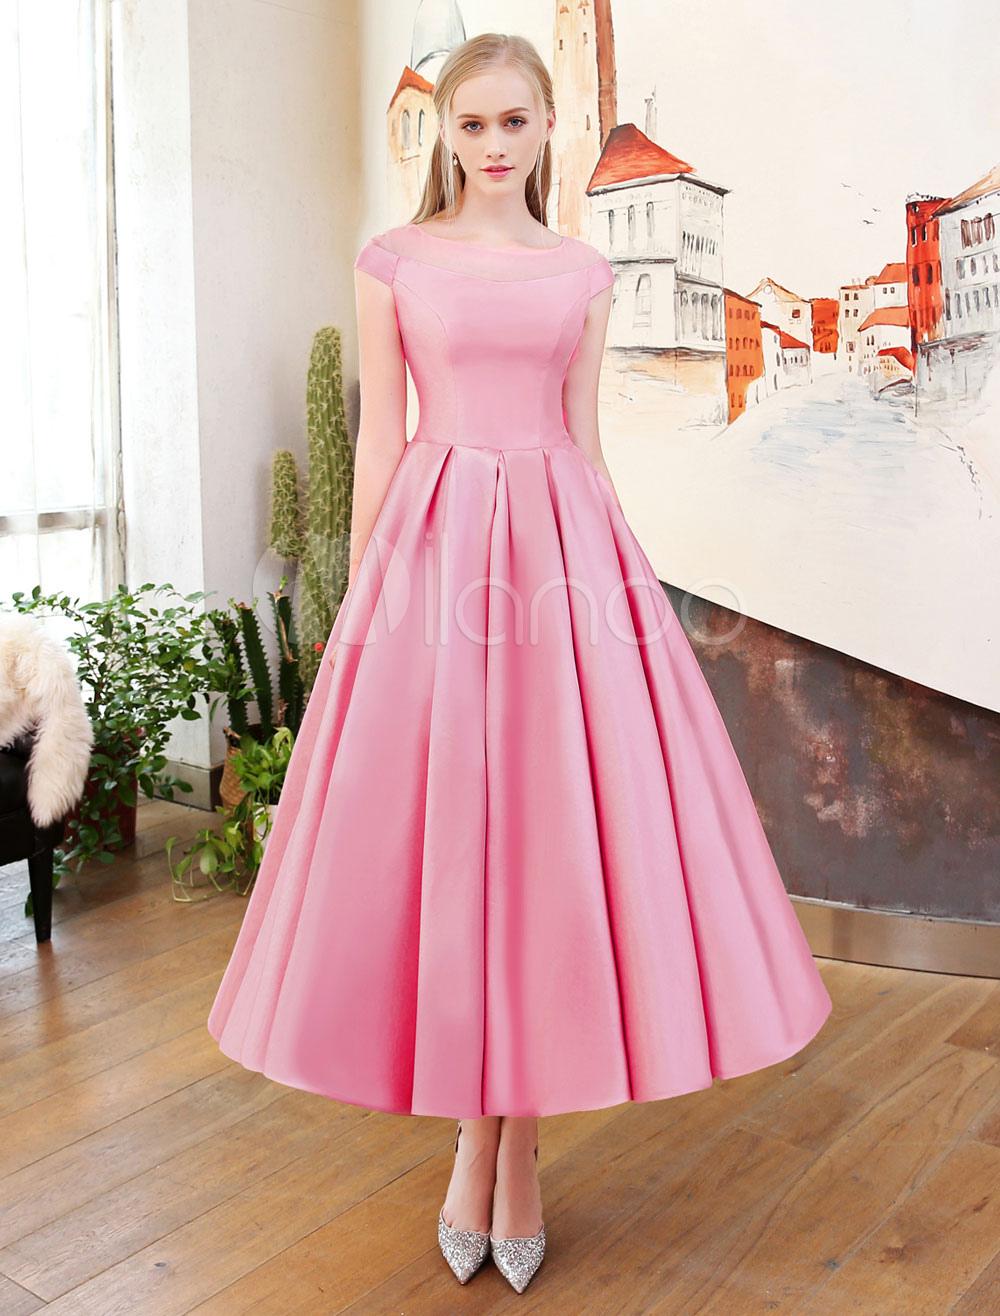 robes de bal courtes cameo robe de f te de mariage en satin rose pliss vintage 39 s illusion. Black Bedroom Furniture Sets. Home Design Ideas